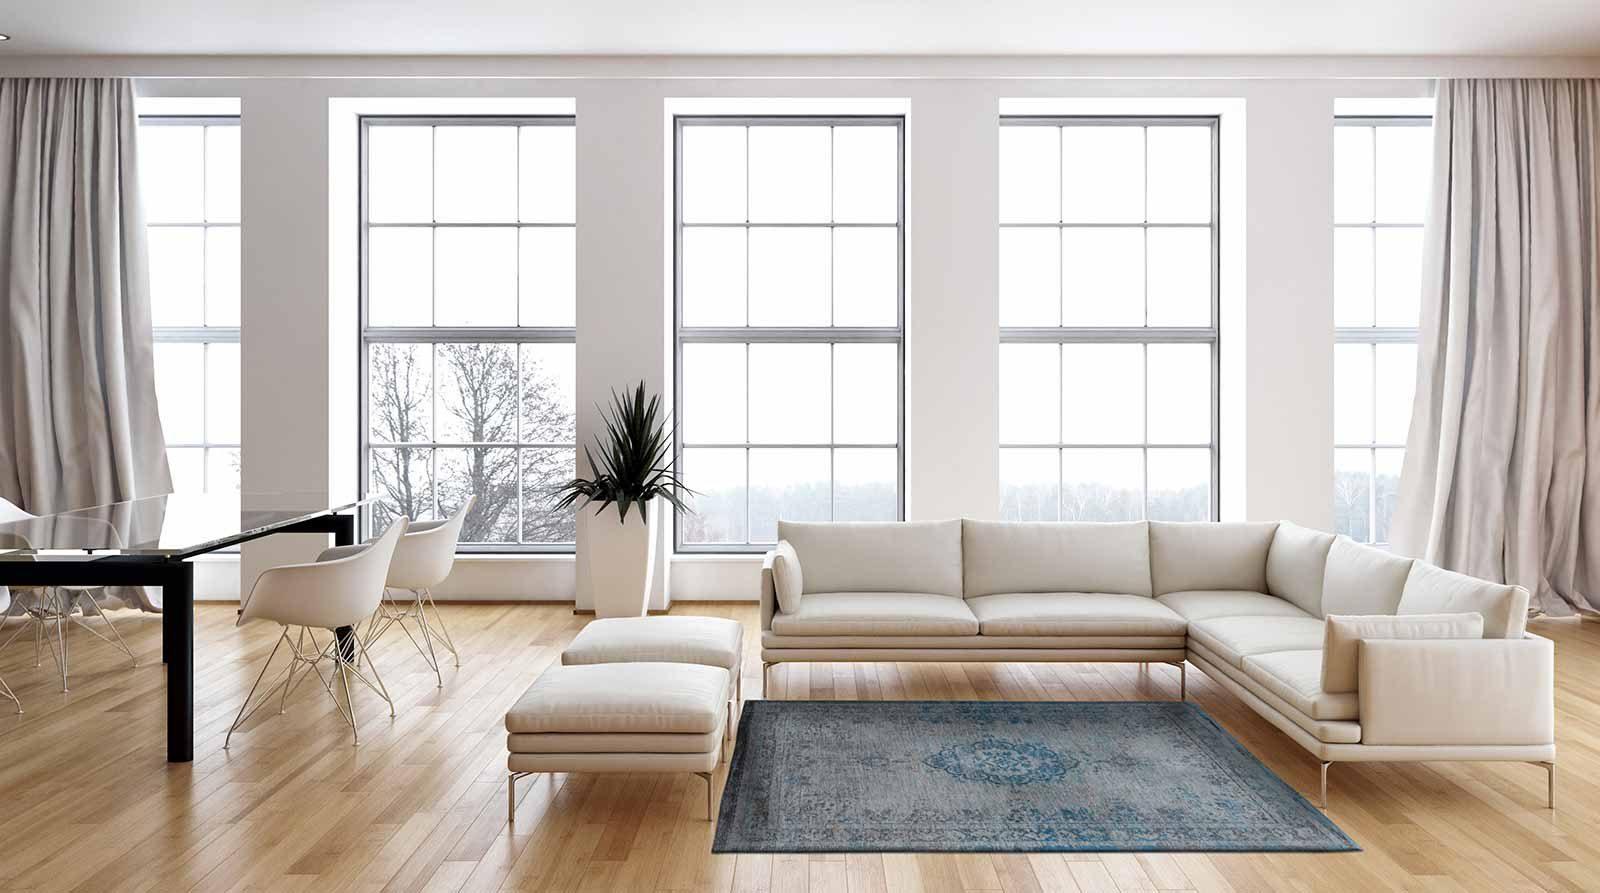 alfombras Louis De Poortere LX8255 Fading World Medaillon Grey Turquoise interior